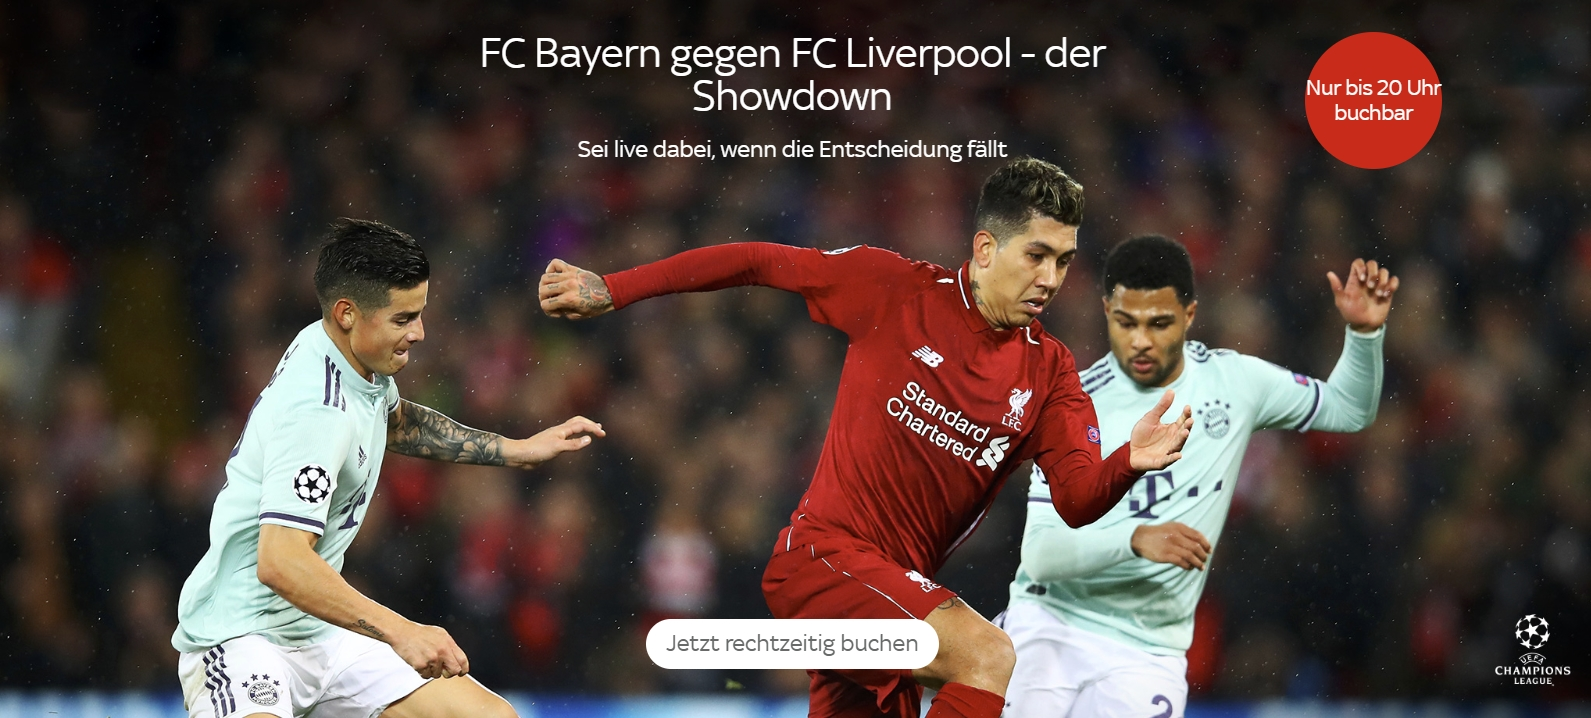 sky-ticket-sport-bayern-liverpool